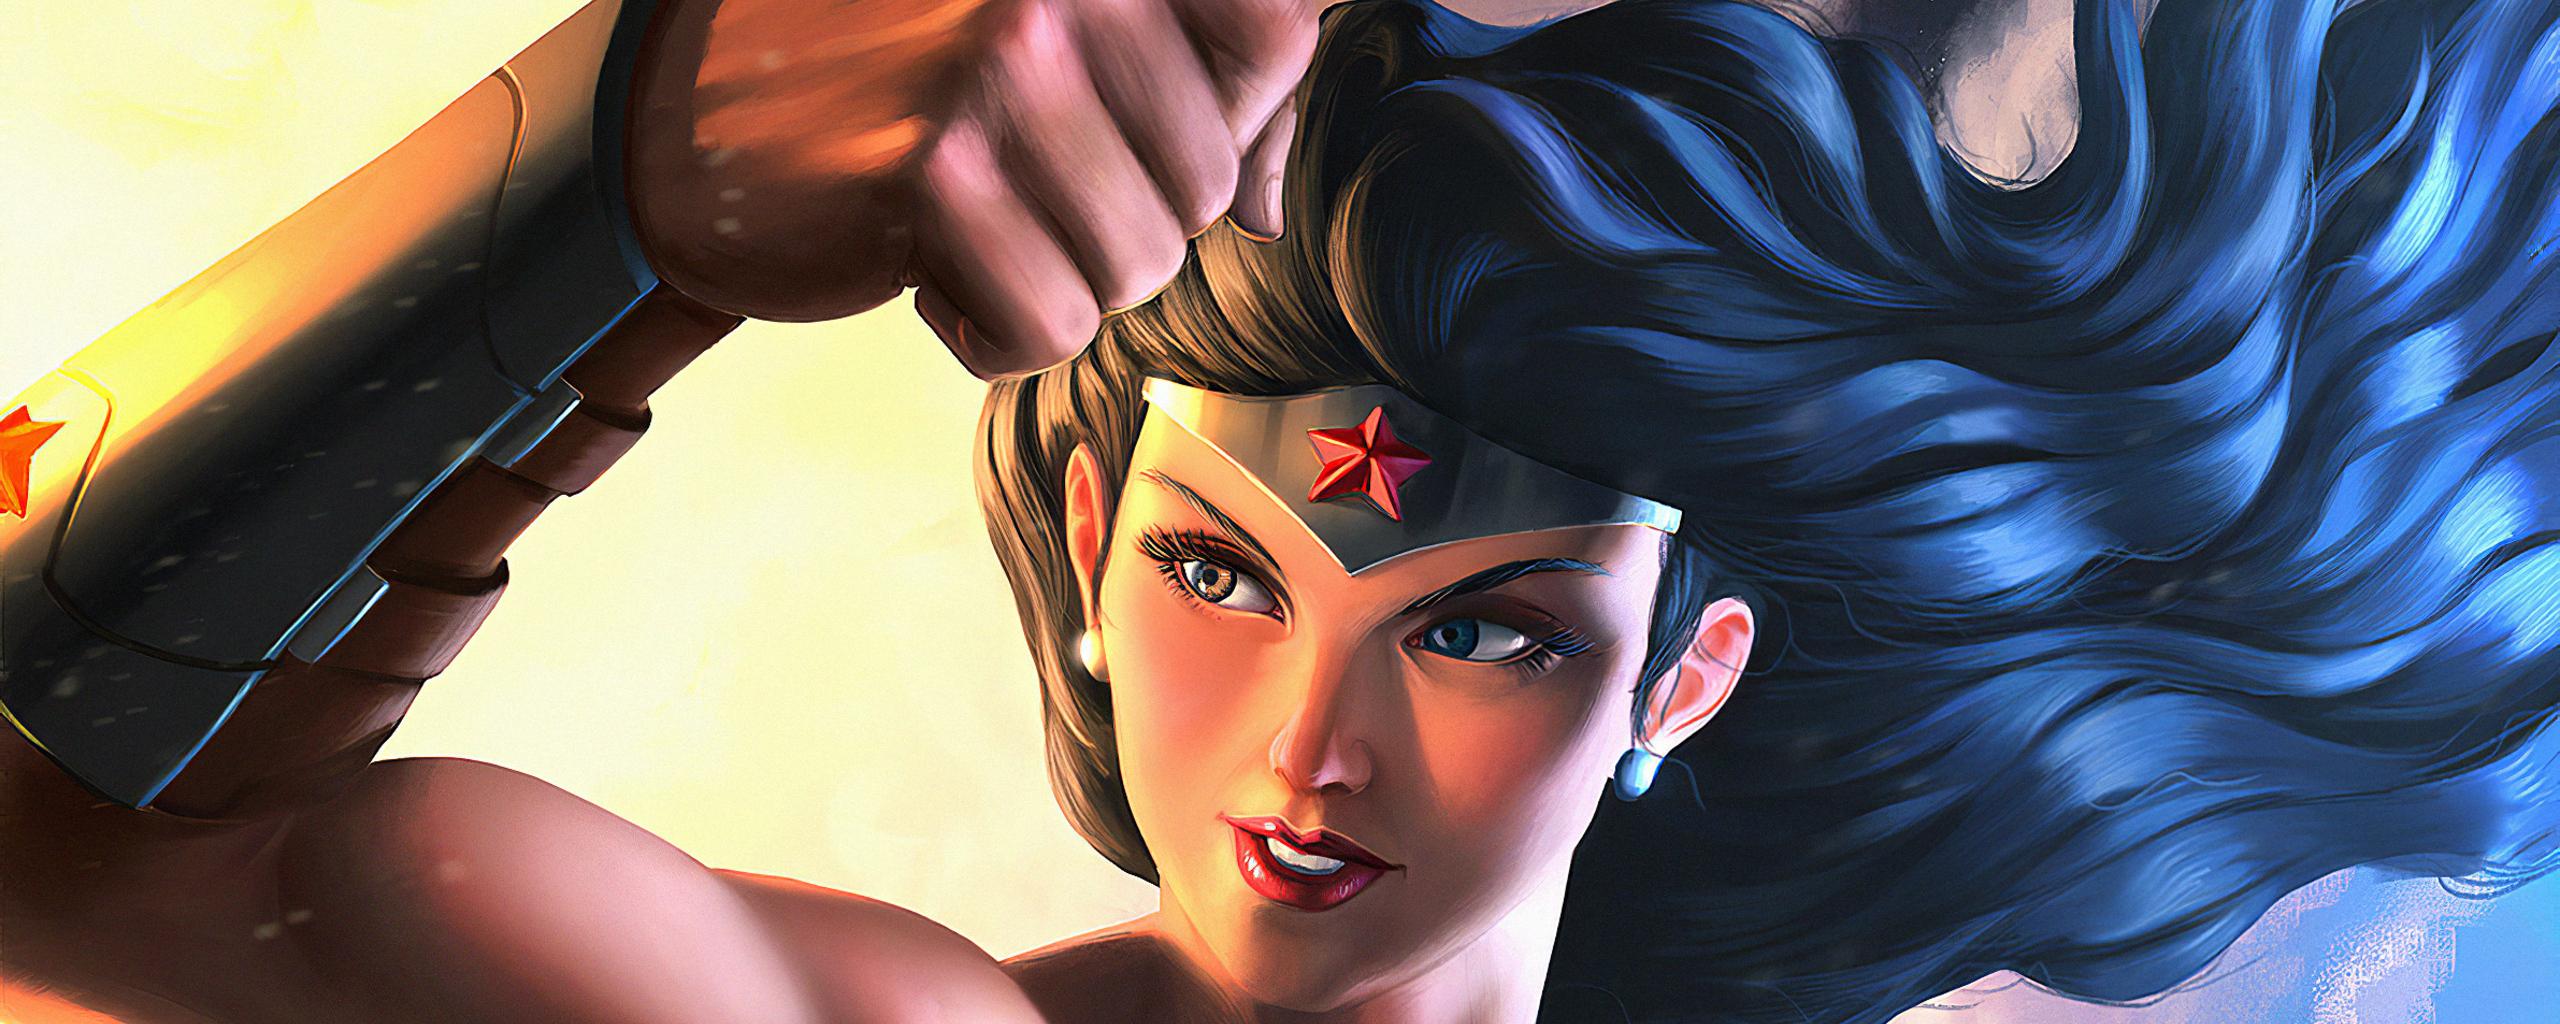 wonder-woman-muscles-93.jpg